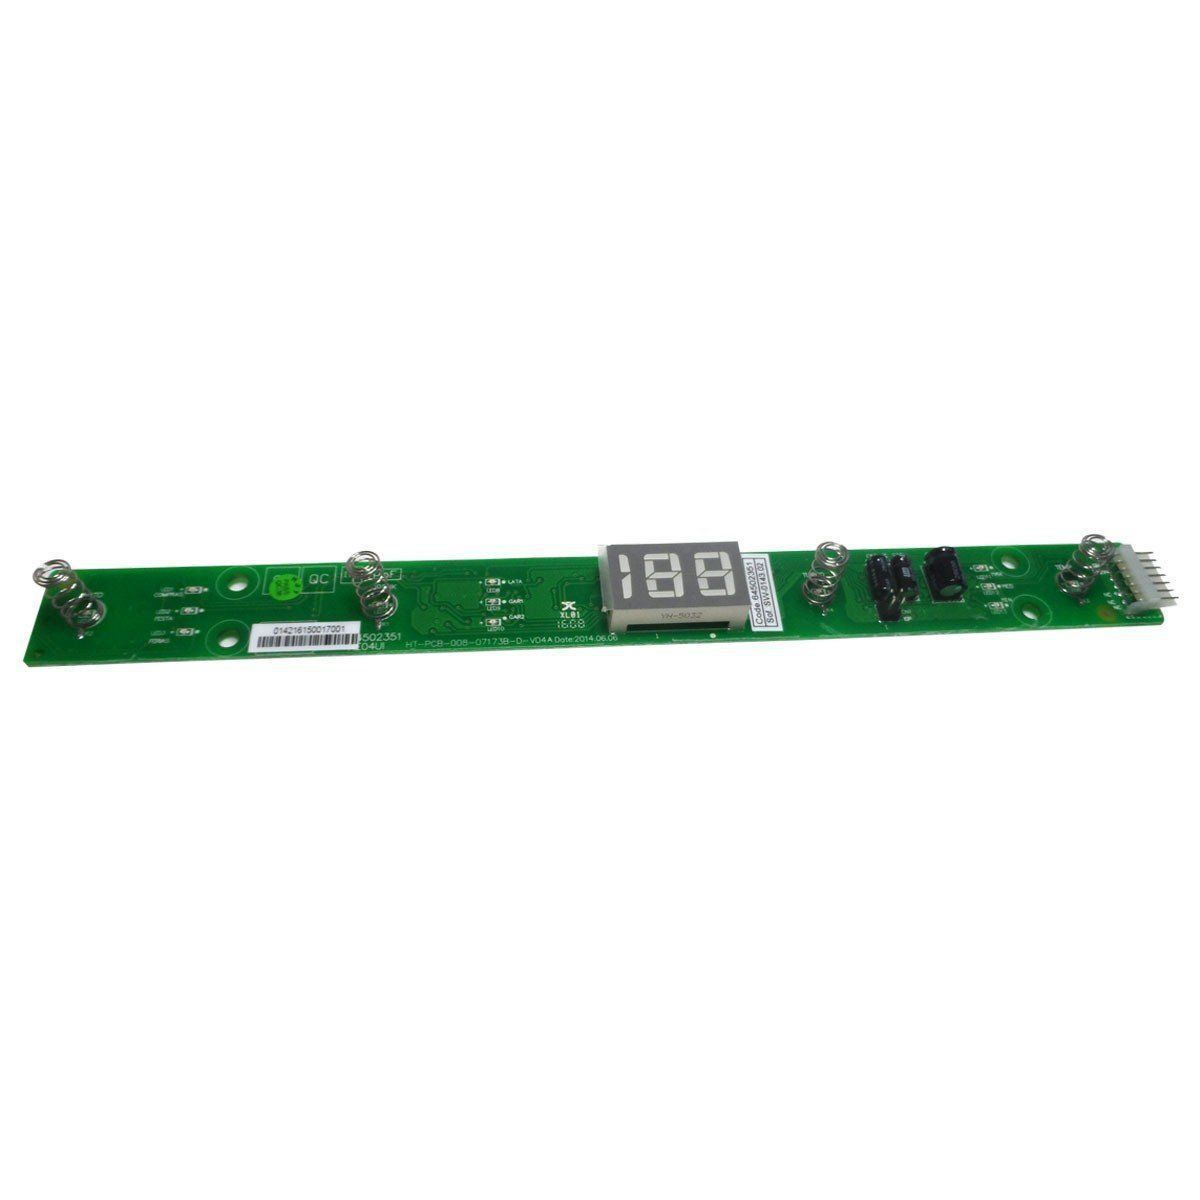 Placa Interface Refrigerador Electrolux 64502351